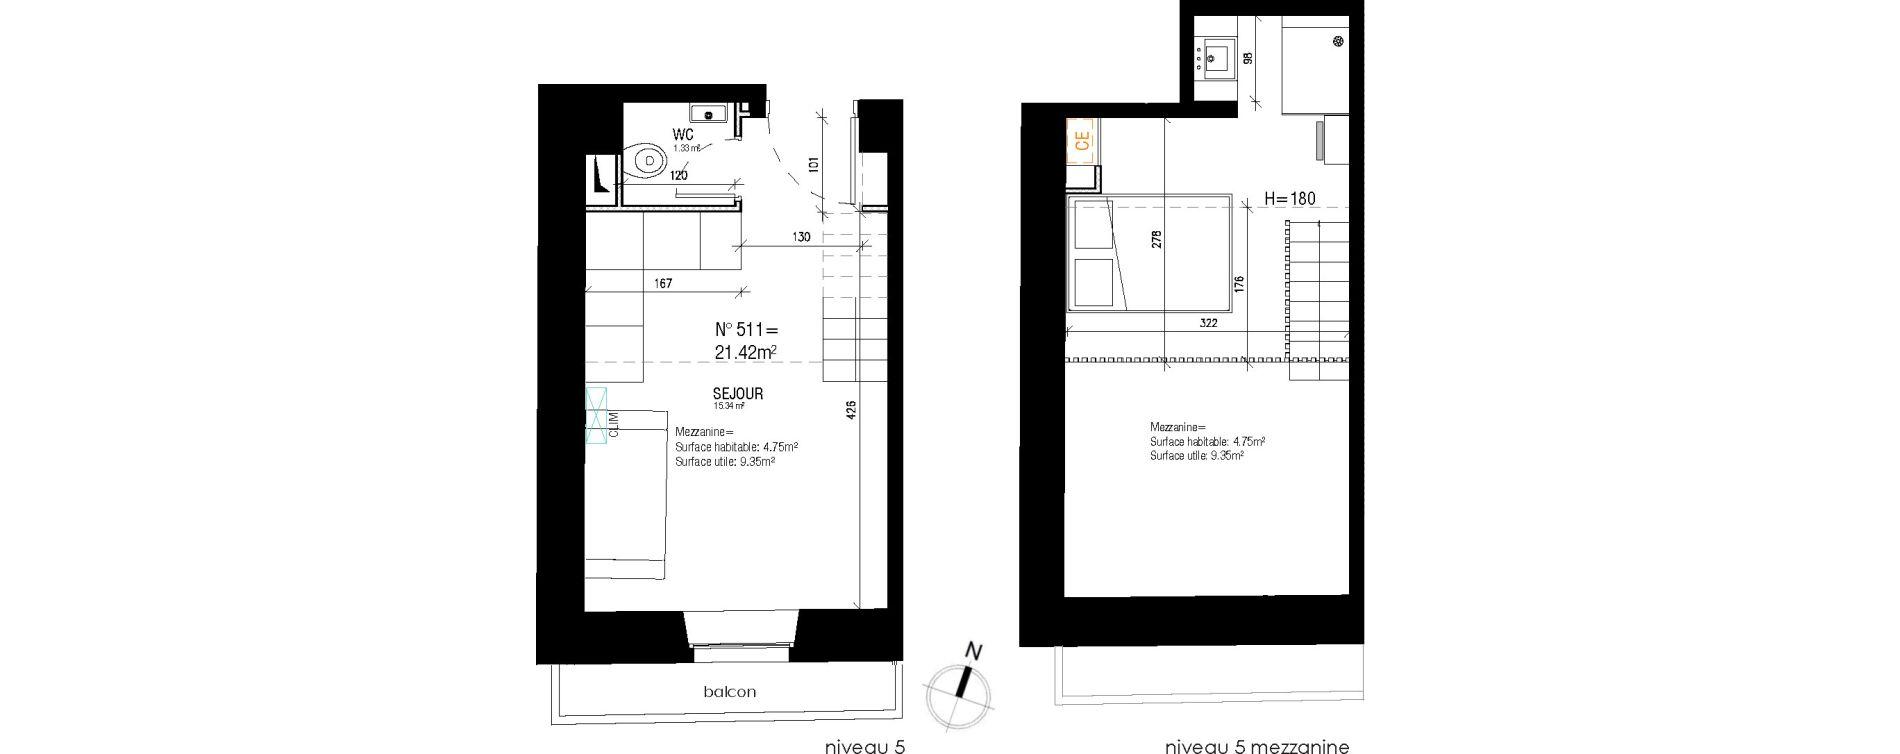 Appartement T2 de 21,42 m2 à Nice Jean medecin